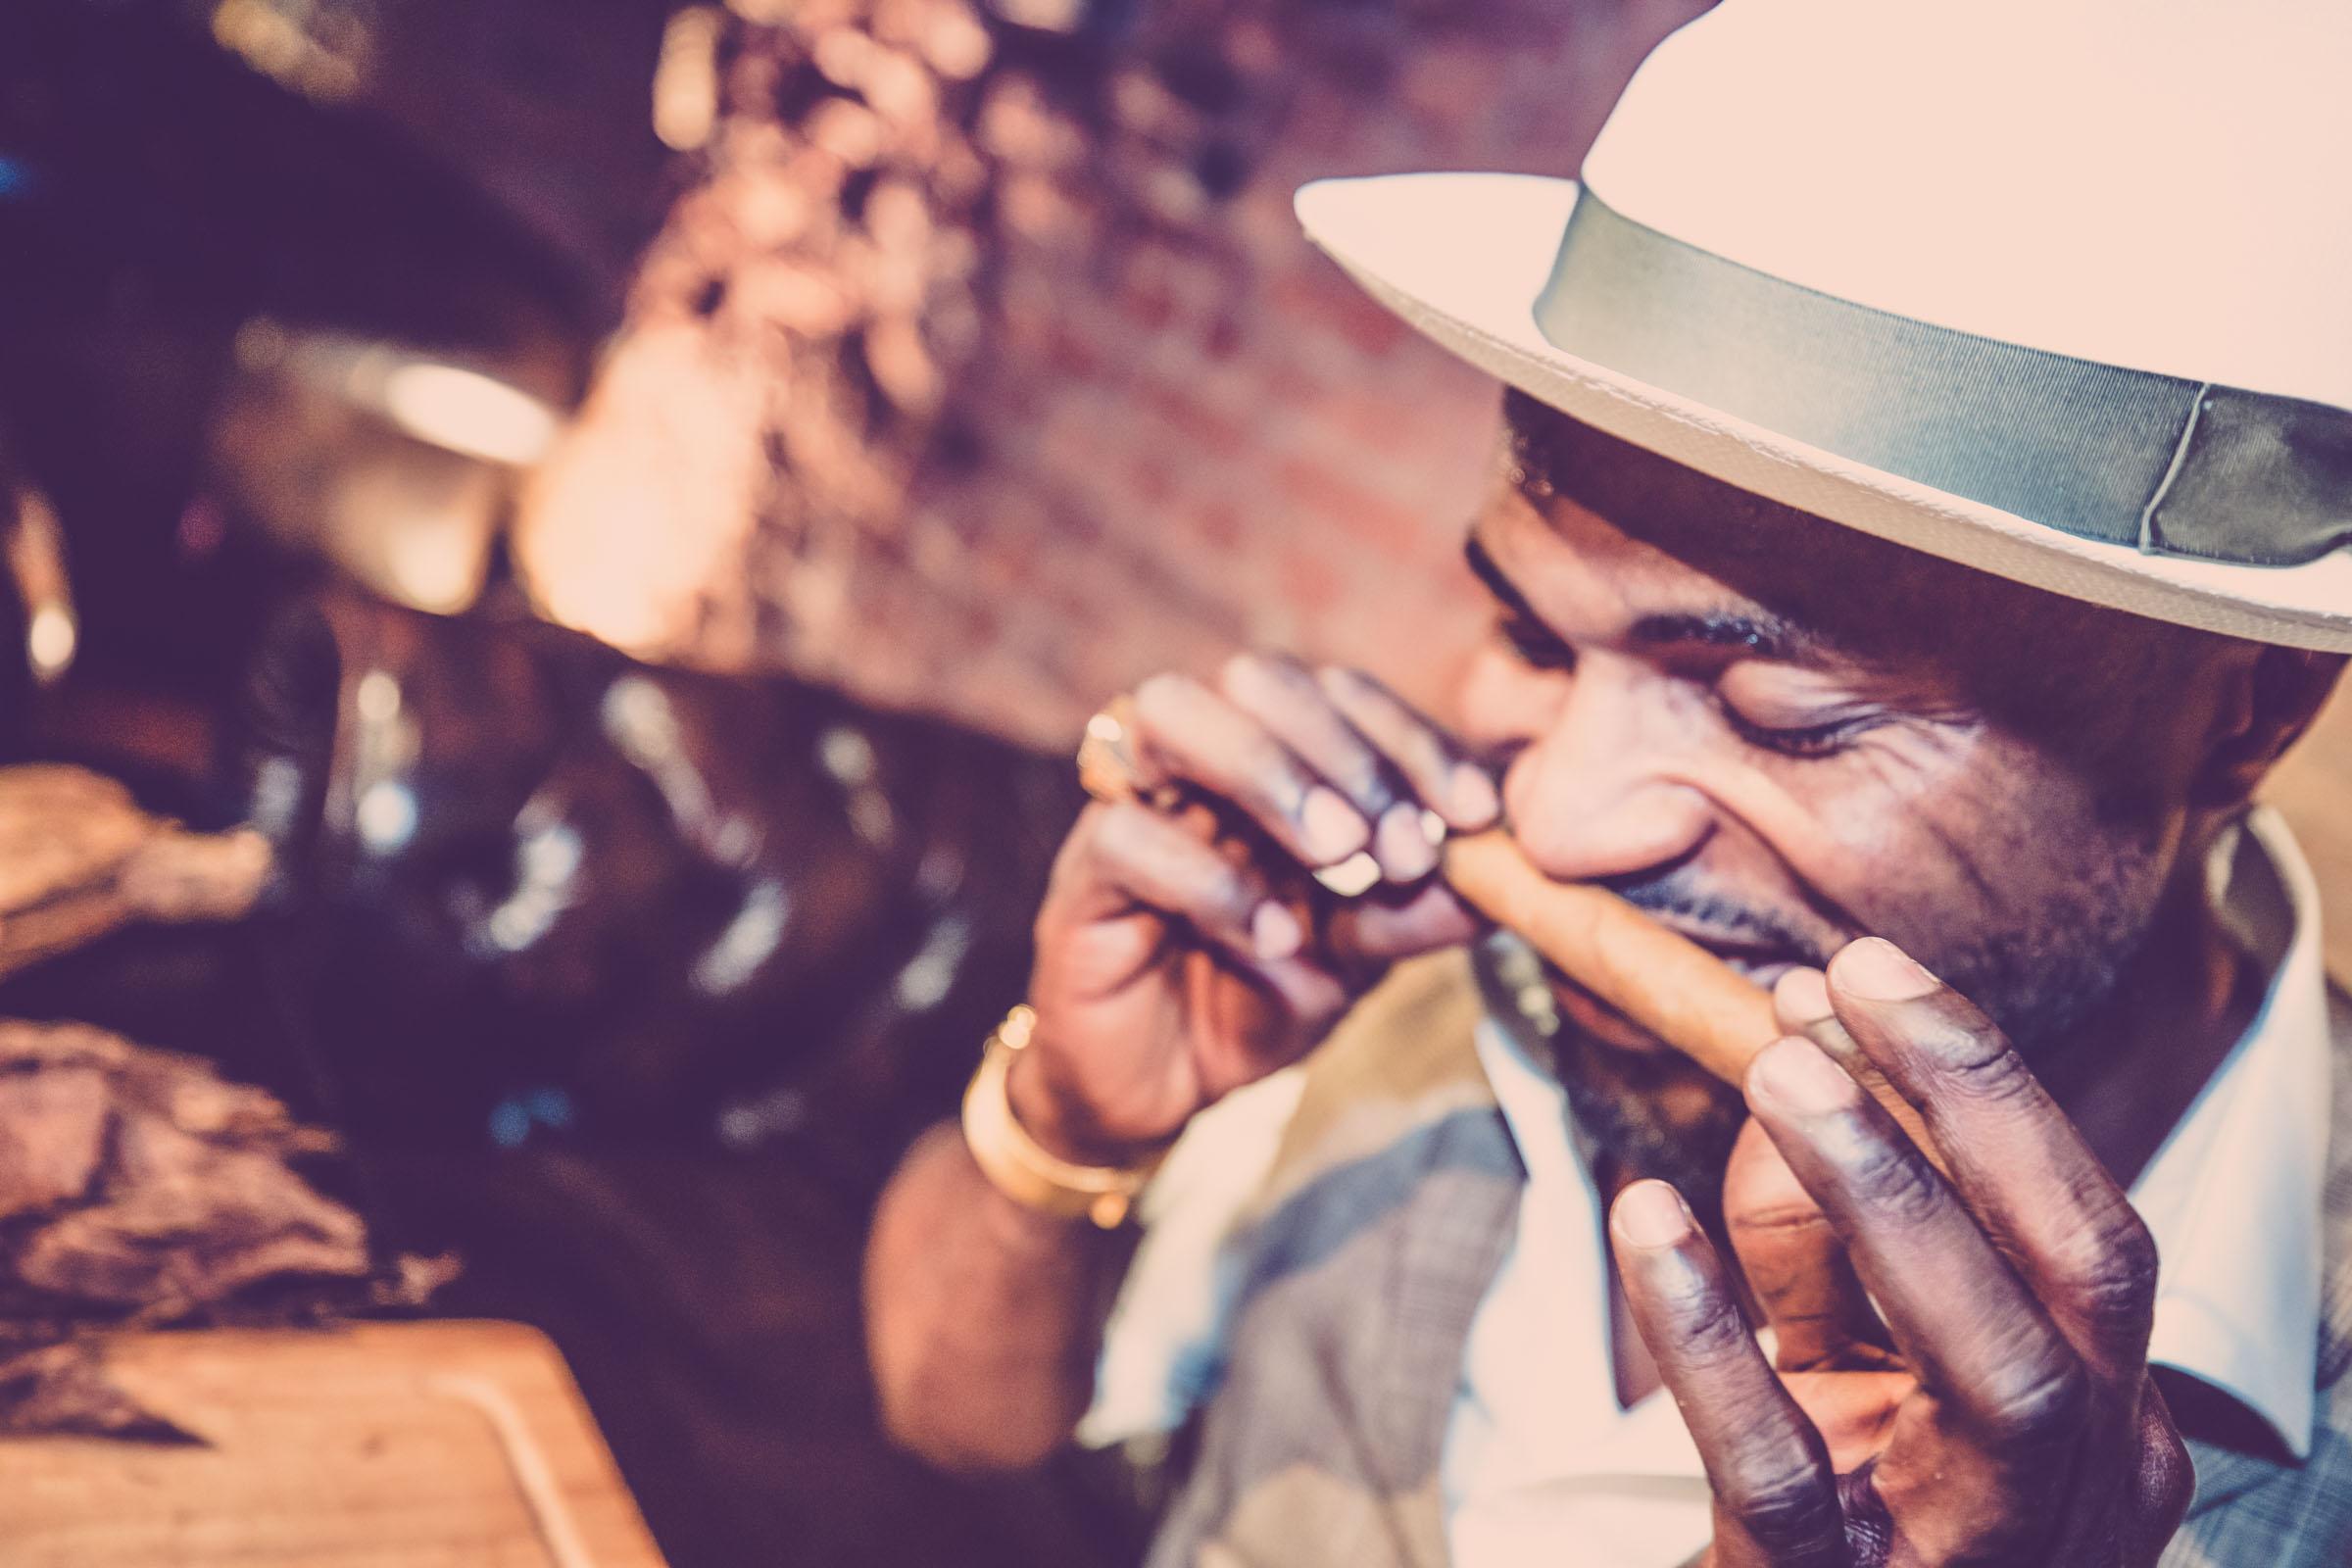 Zigarrenroller - Zigarrendreher Tabakroller | Zigarrenrollerin | Zigarrenherstellung | Hochzeit | Messen | Gala |Event | Buchen | Mieten | Anfragen